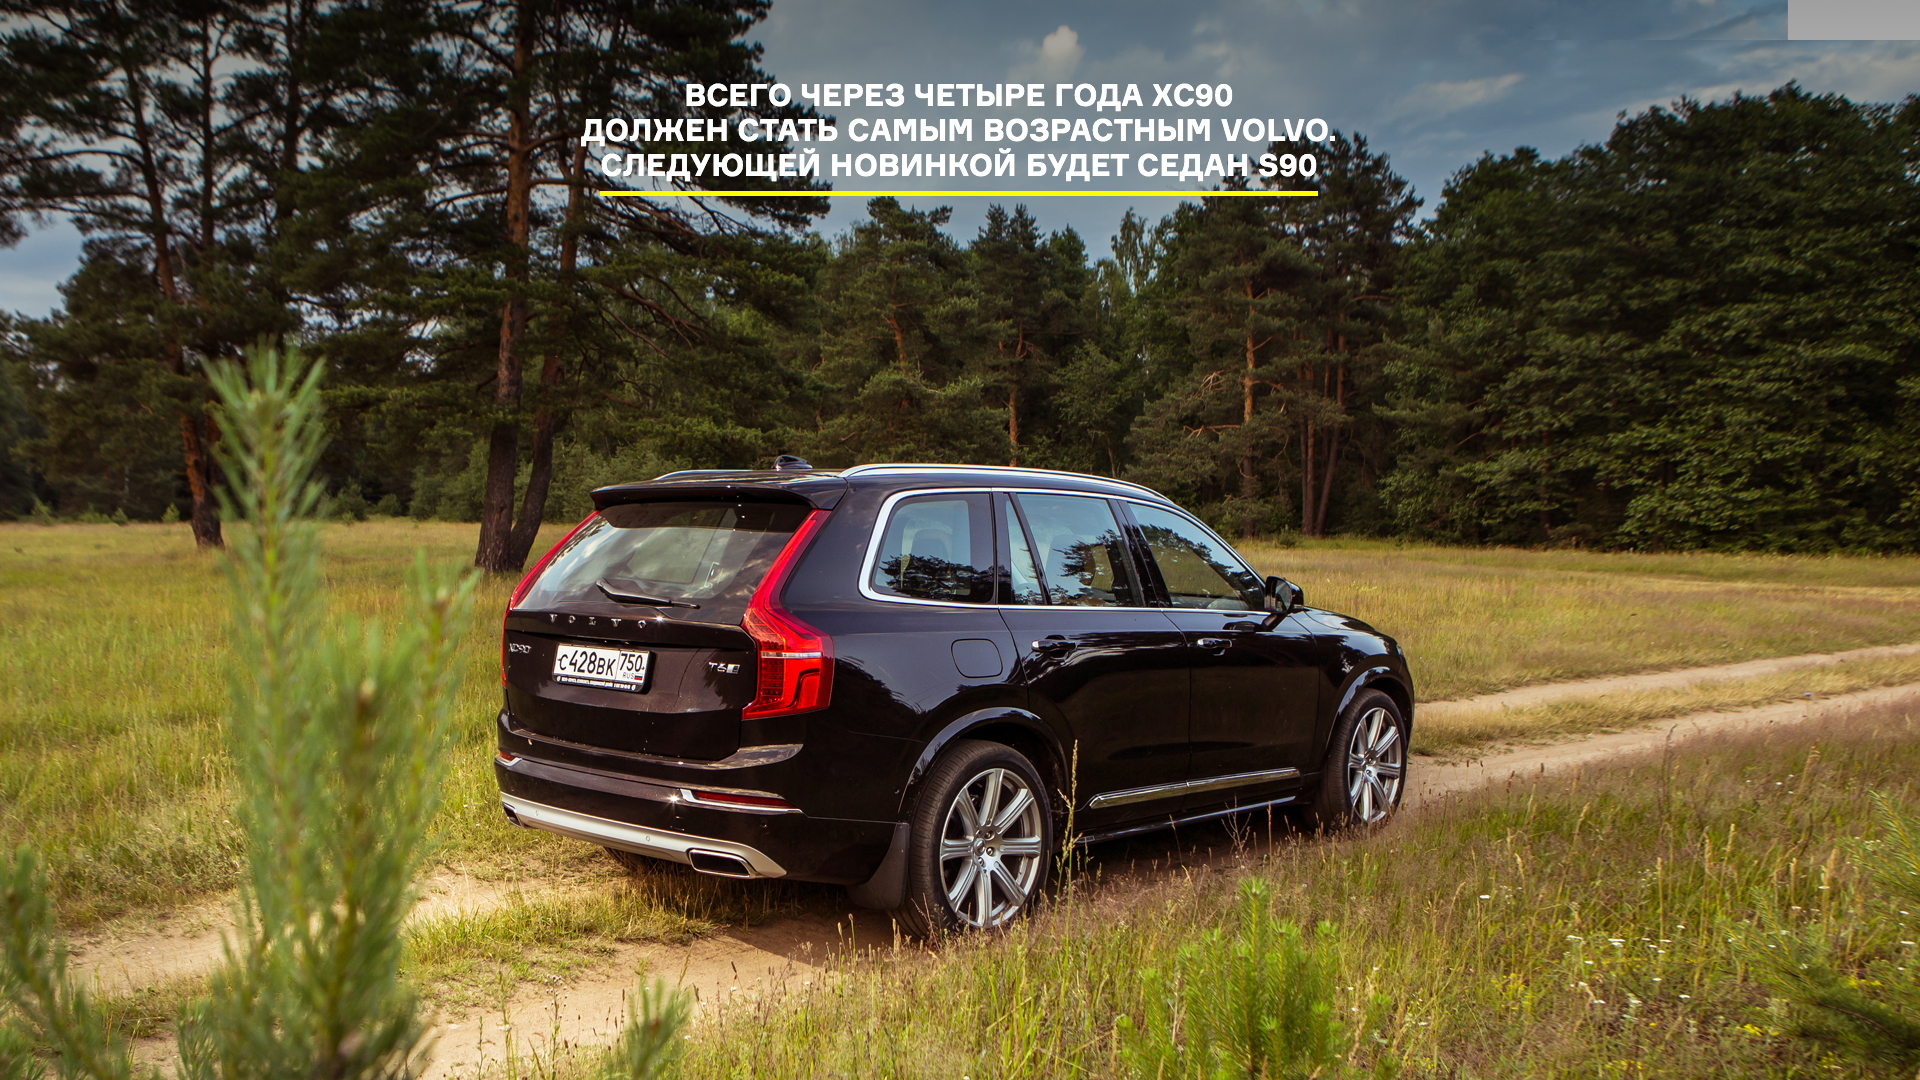 21-дюймовые колеса вроссийских ямах иматрешка вместо рычага «автомата»: тест Volvo XC90. Фото 19